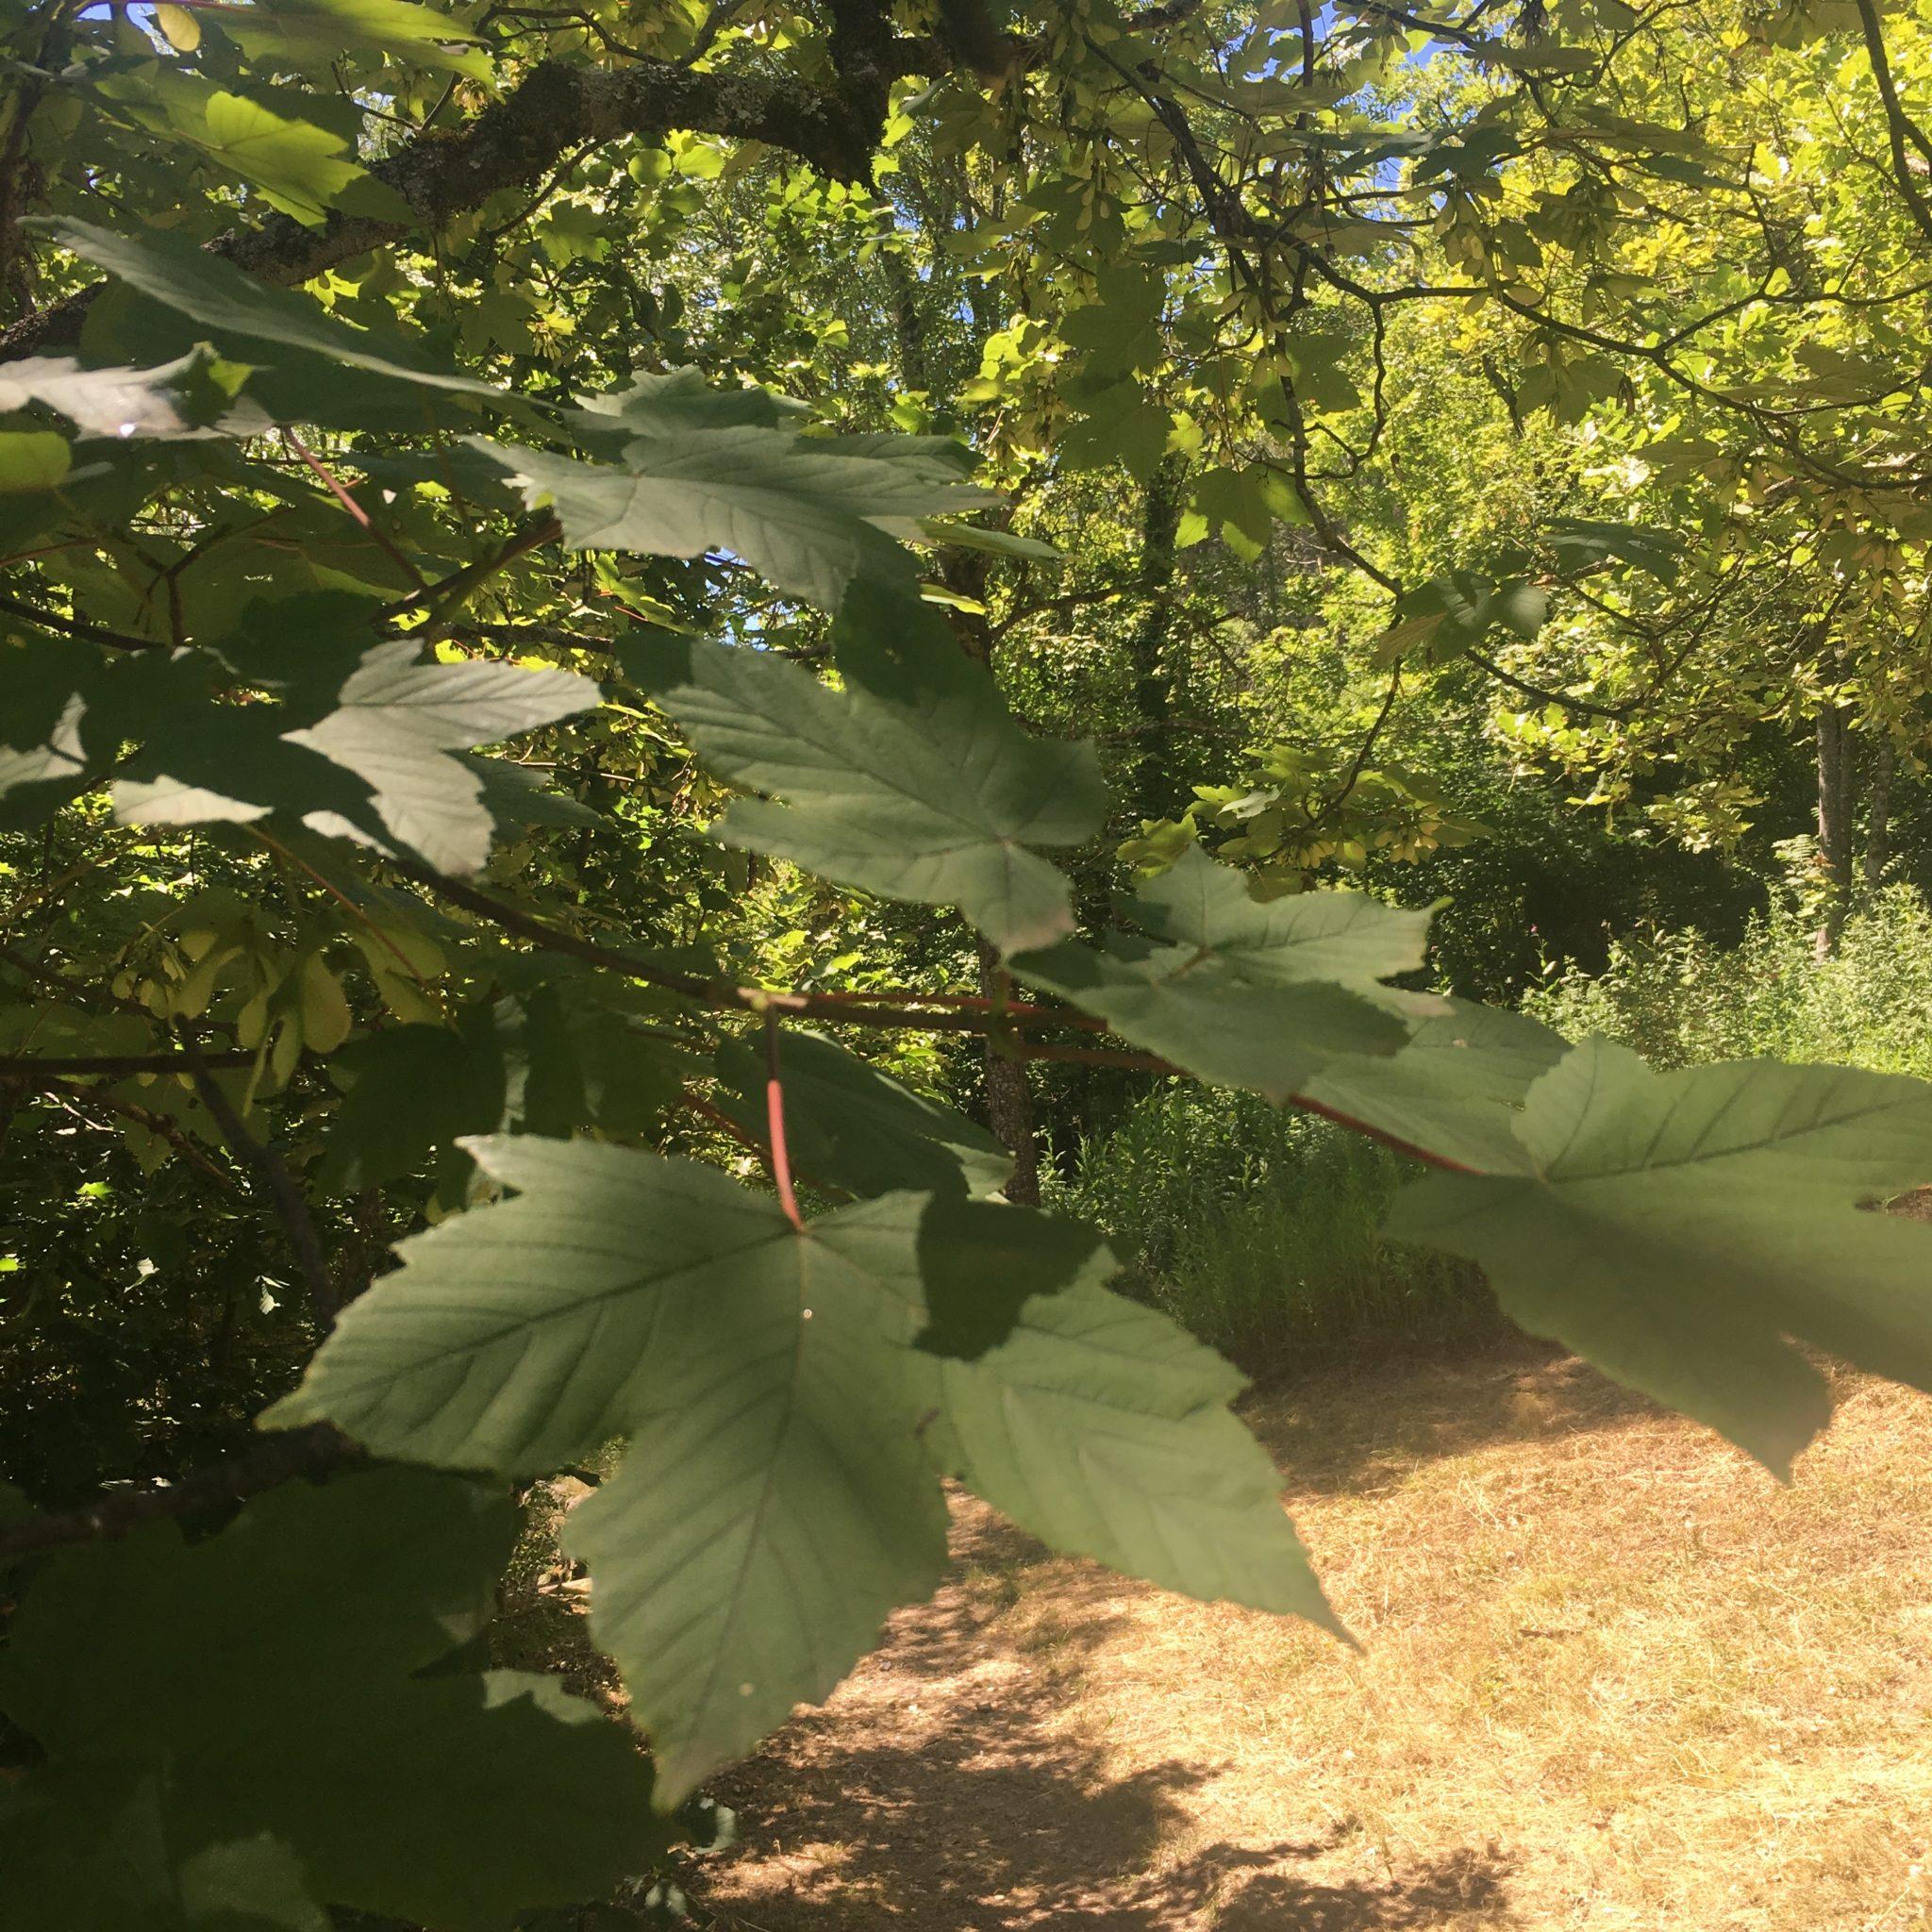 Acer platanoides